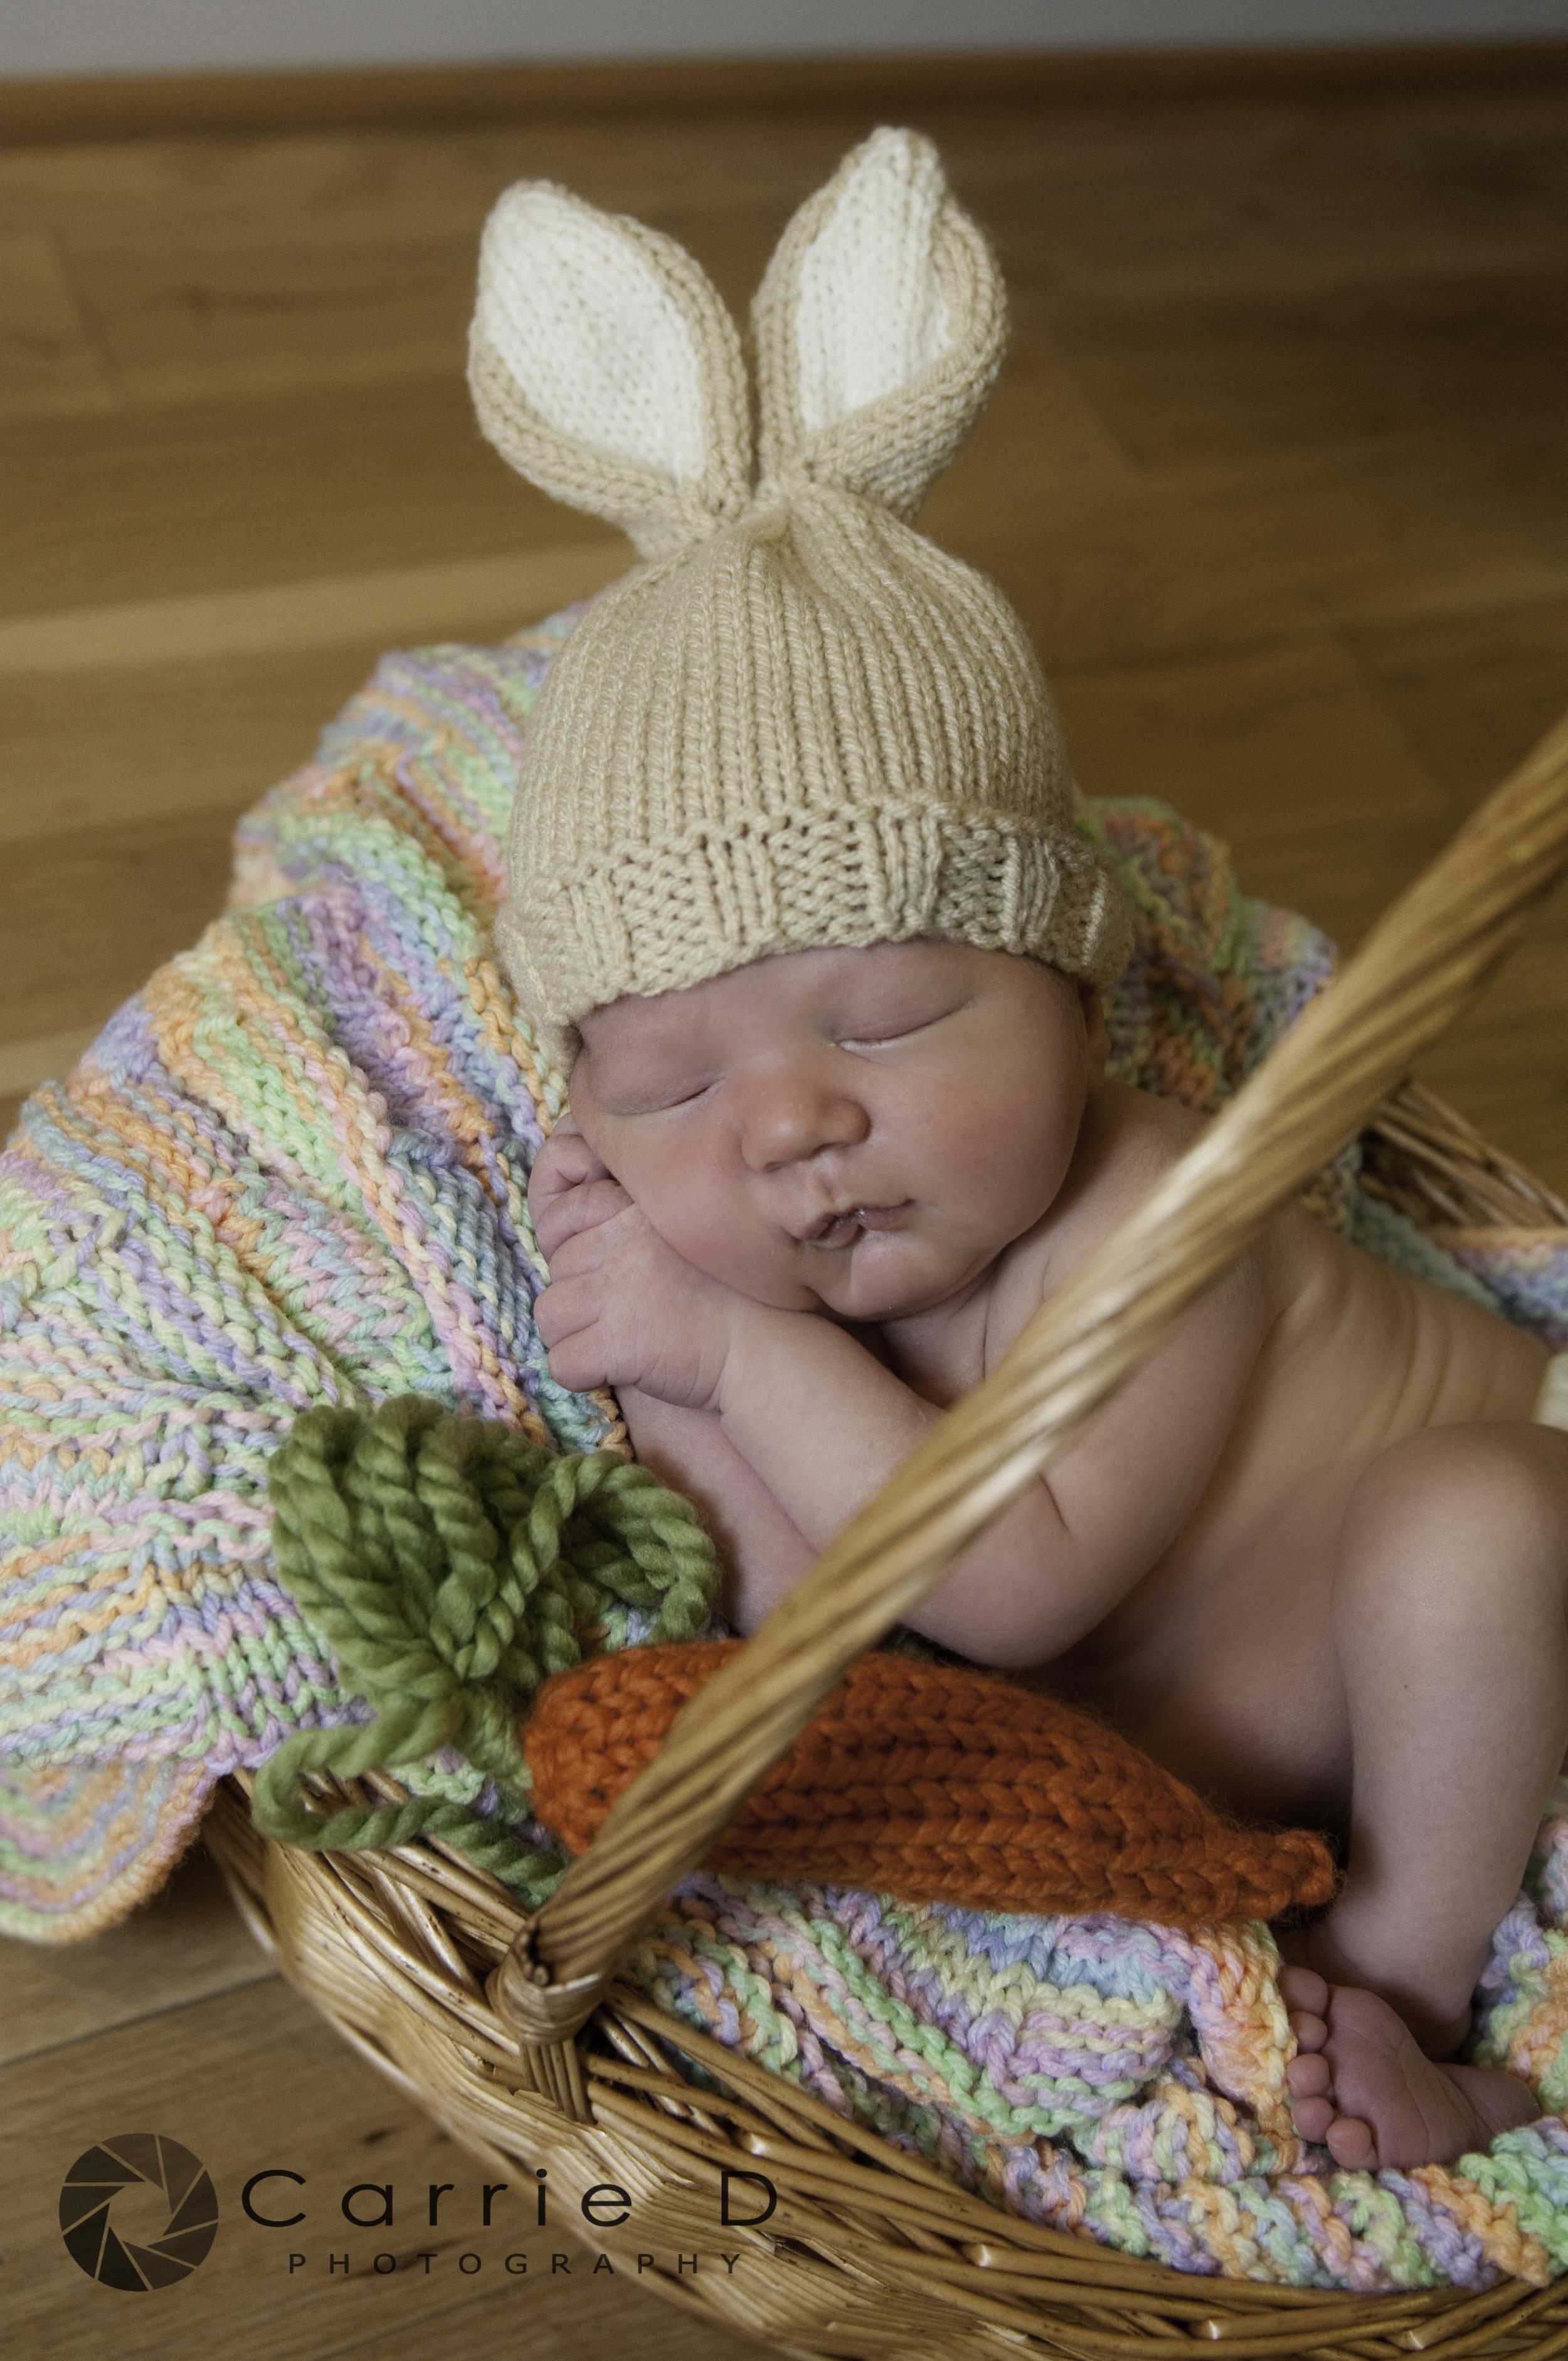 Baltimore Newborn Photographer - Natural Light Newborn Photography - Newborn Easter Photo - Natural Light Family Photography